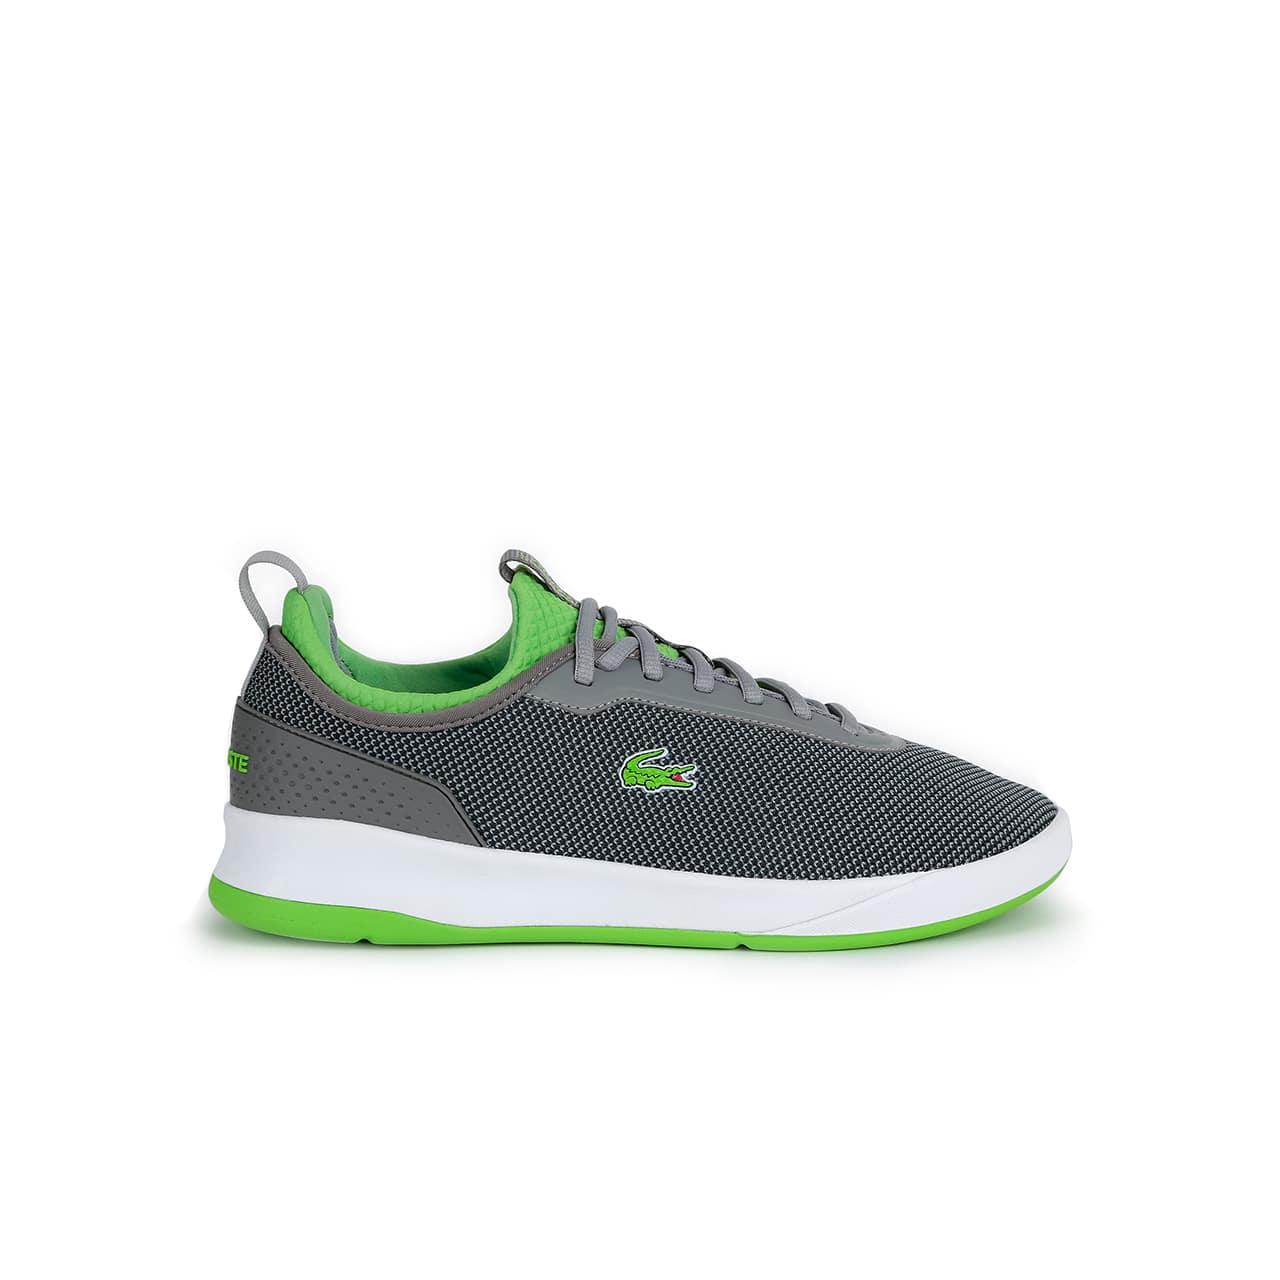 7c3246bac Lacoste Men s Lt Spirit 2.0 Textile Sneakers In Grey Green